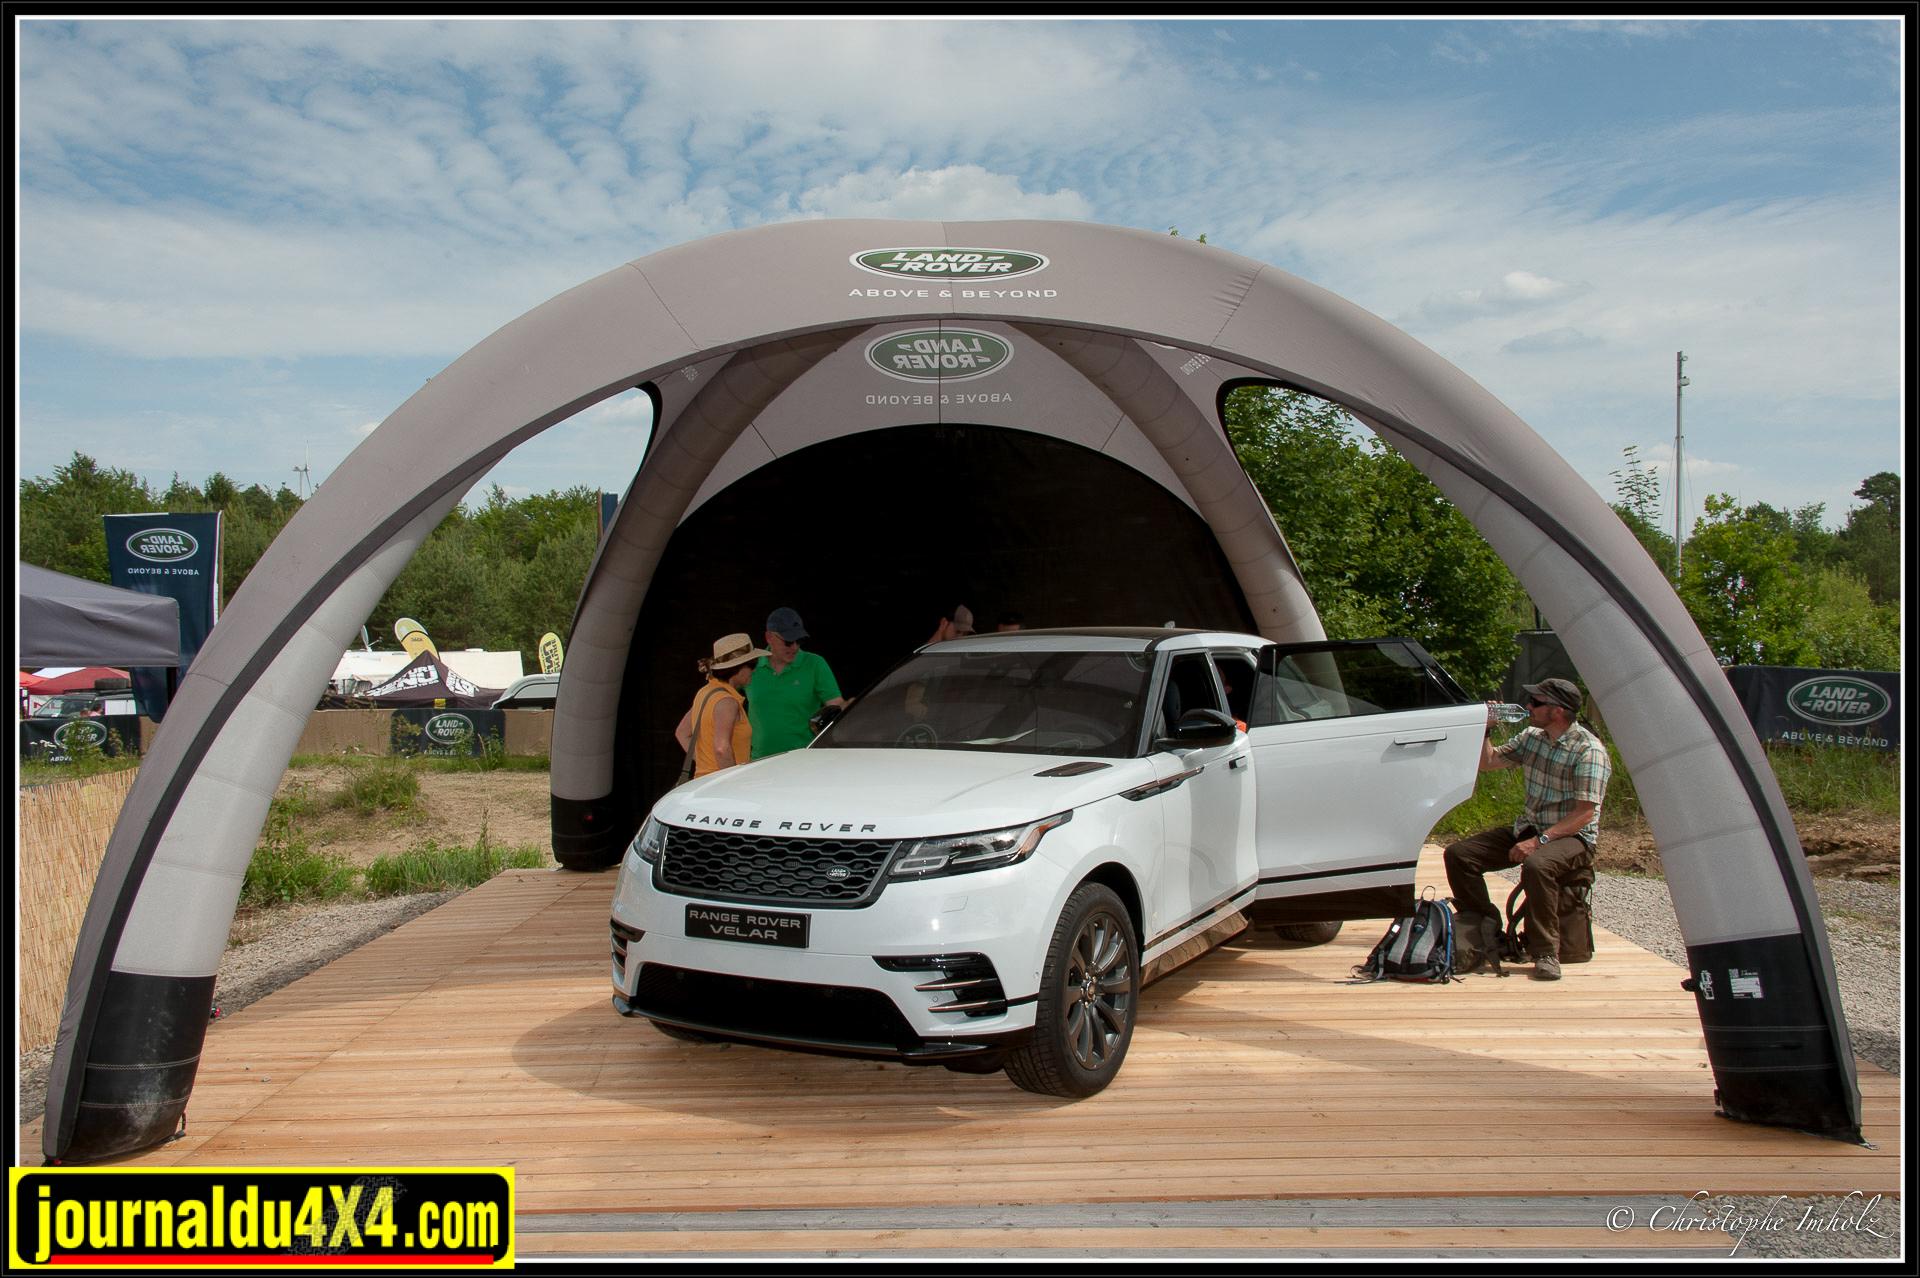 Un Ranger Rover Velar trône en plein milieu du stand Land Rover